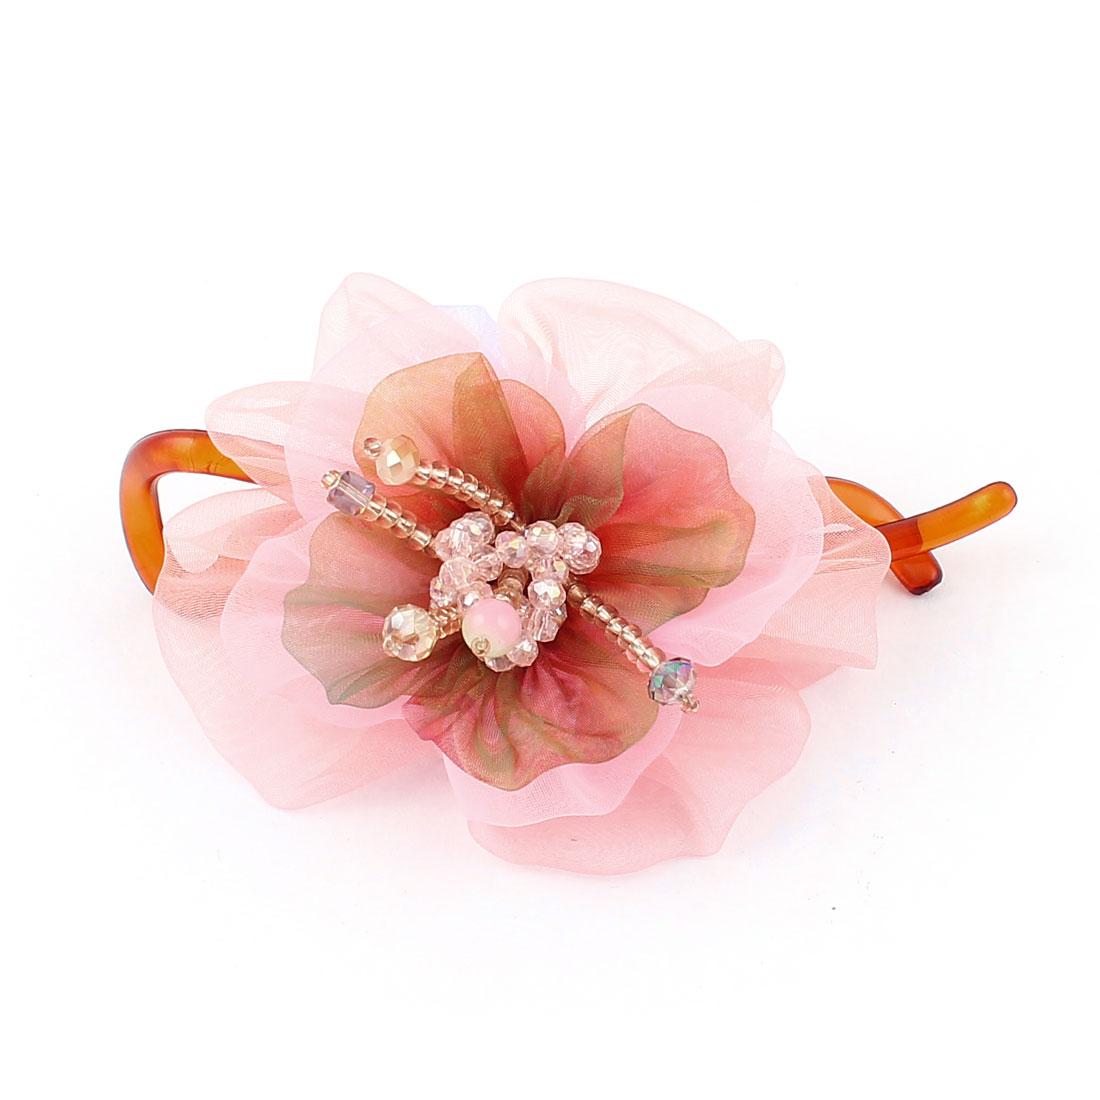 Flower Faux Rhinestone Bead Decor Twisted Banana Hair Barrette Clip Claw Pink